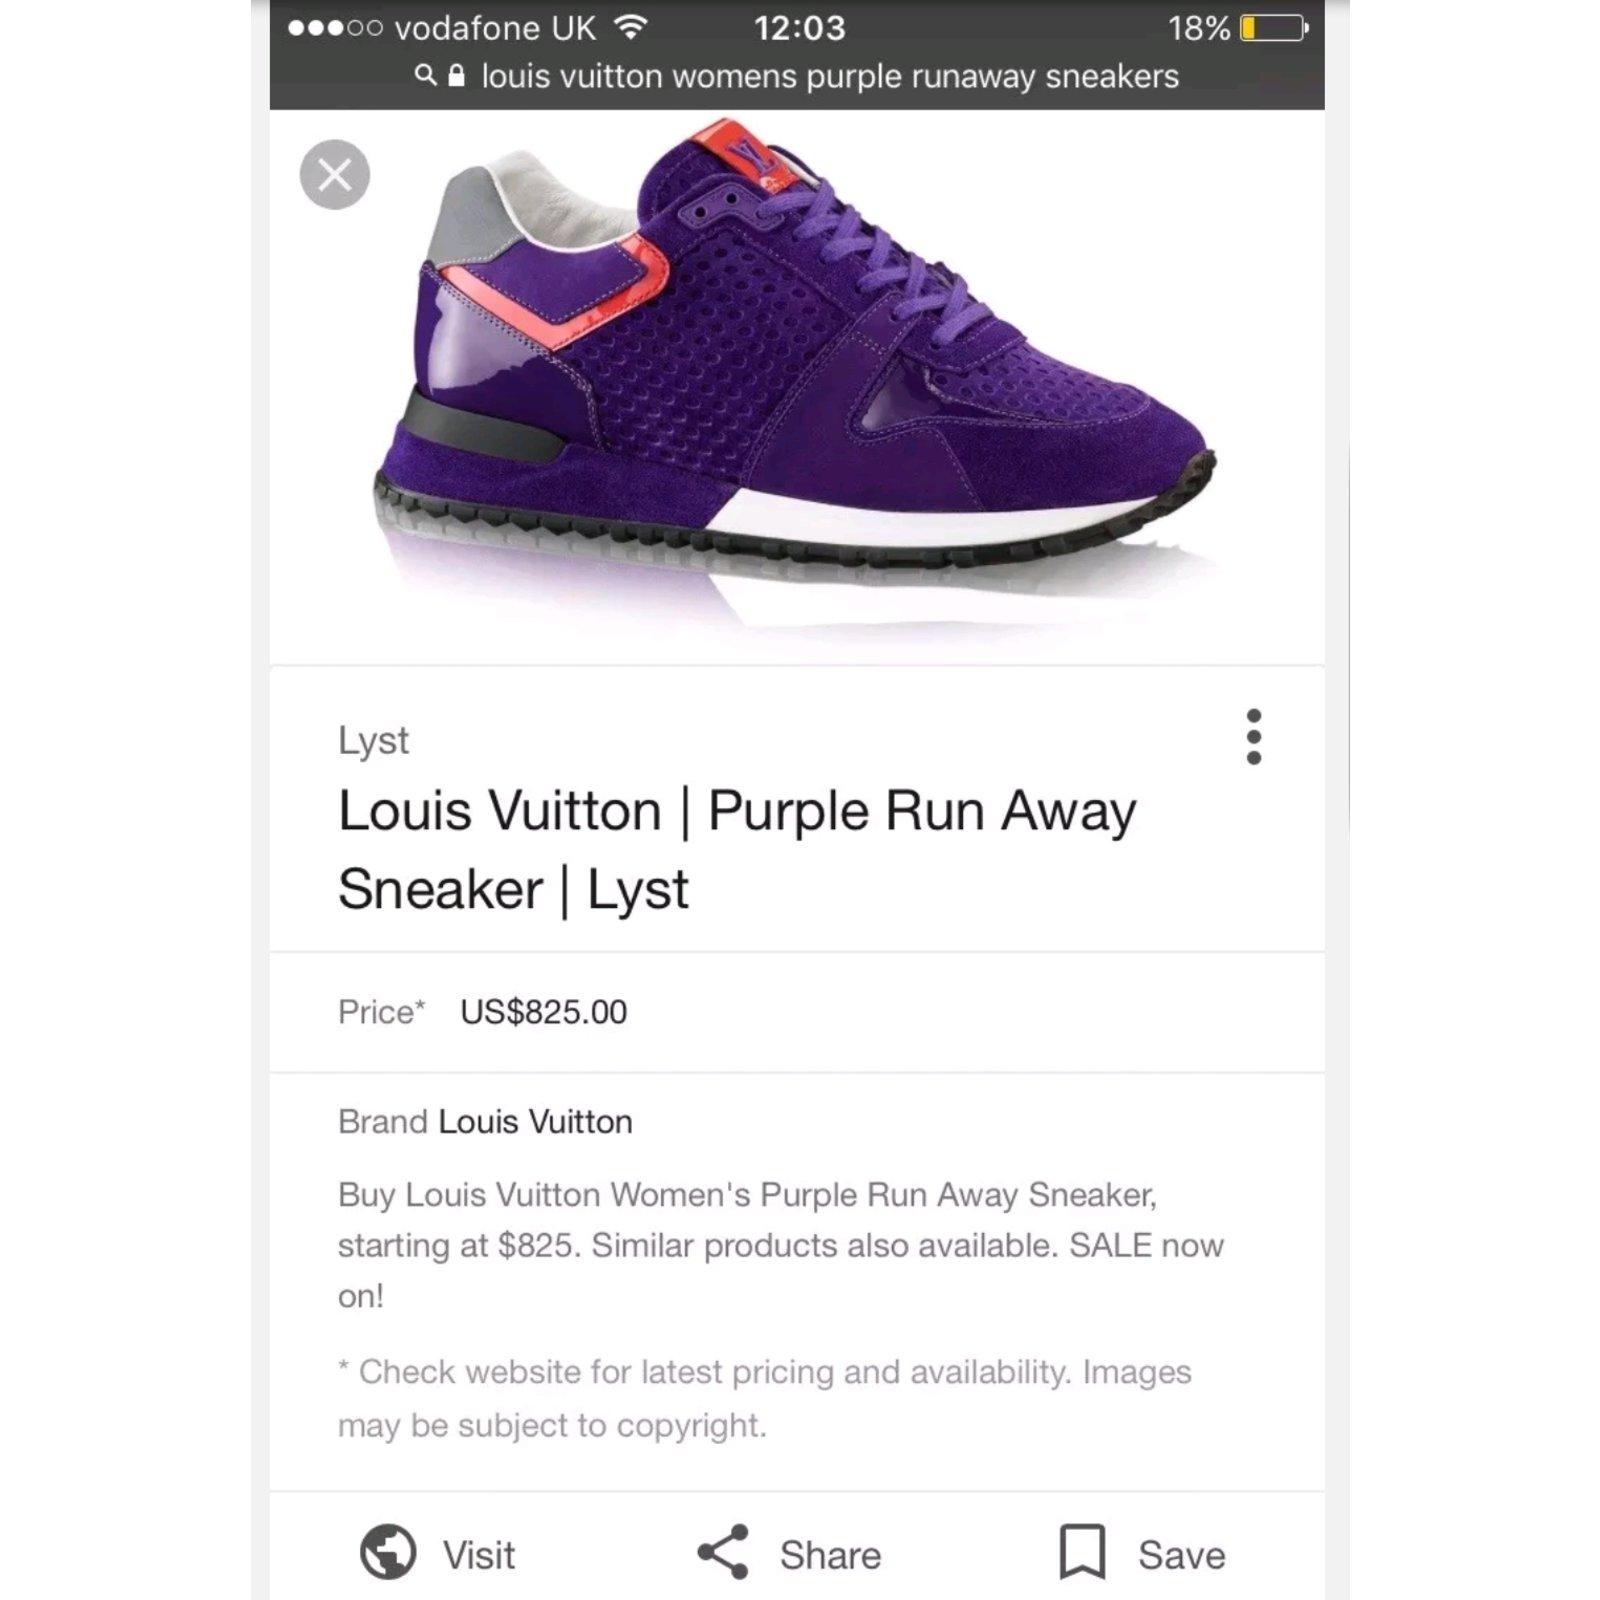 714f56c662a4 Louis Vuitton Louis Vuitton run away purple sneakers trainers size 6 eu 39 Sneakers  Suede